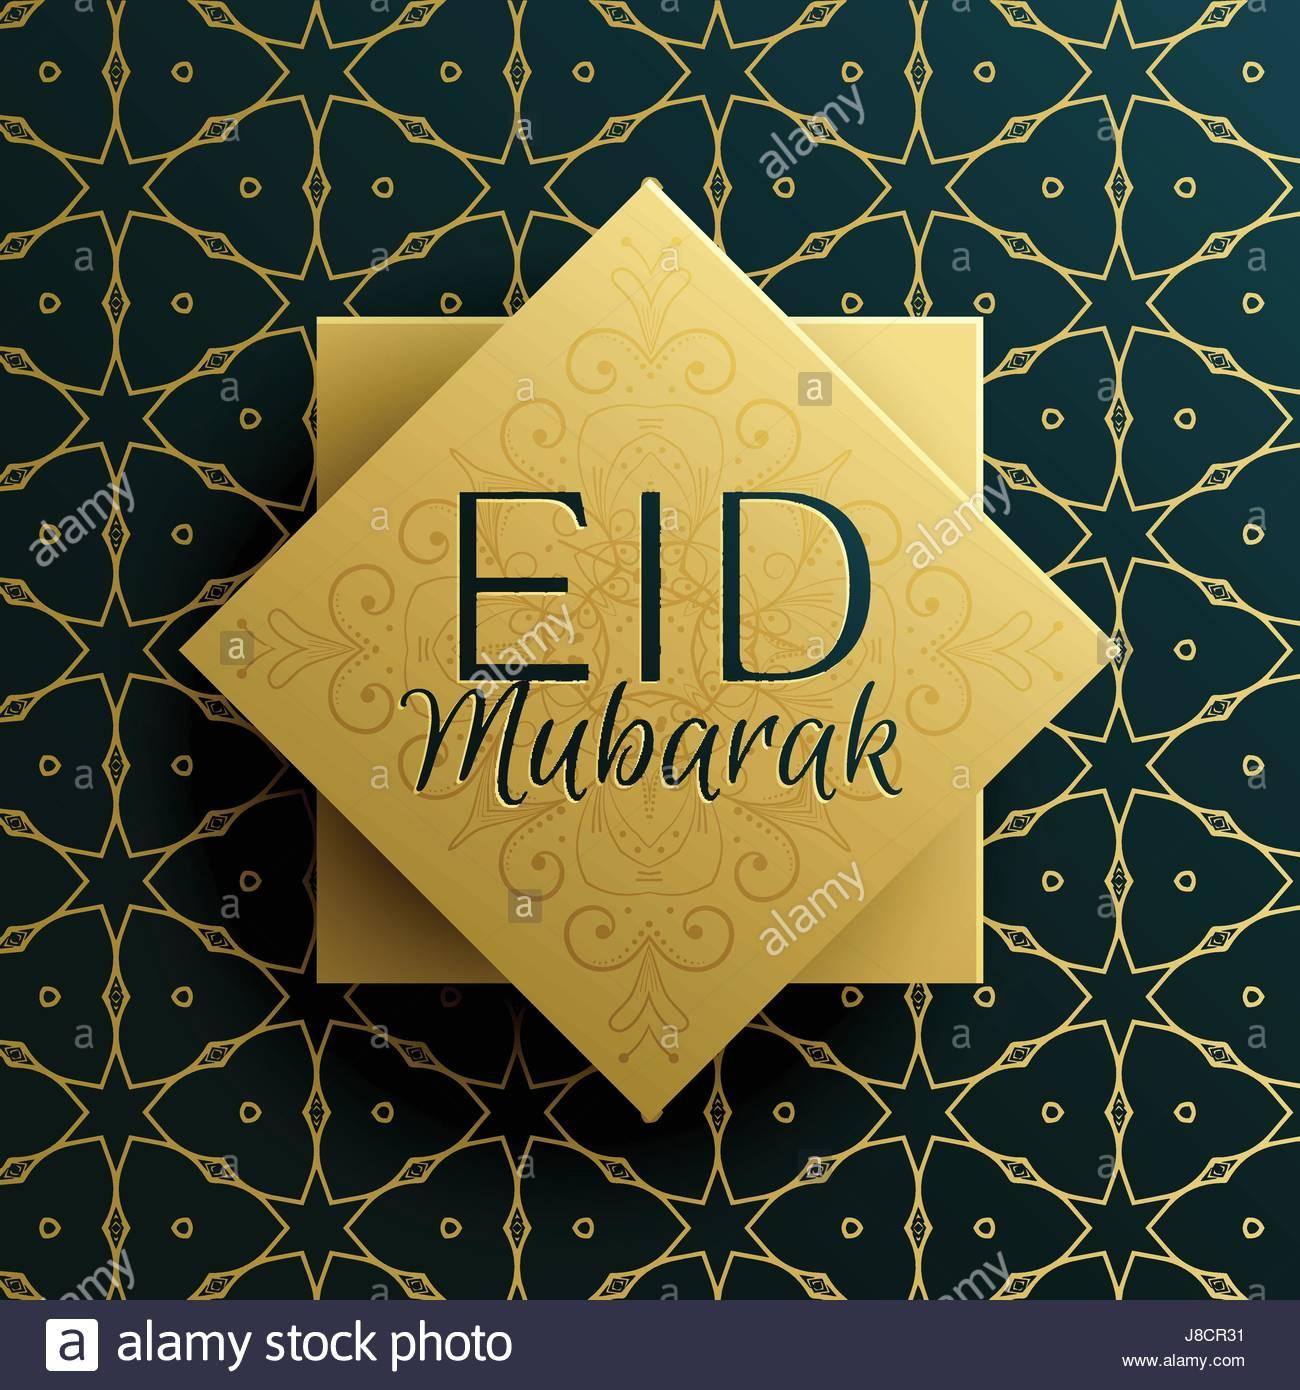 Eid mubarak holiday greeting card template design with islamic stock eid mubarak holiday greeting card template design with islamic pattern m4hsunfo